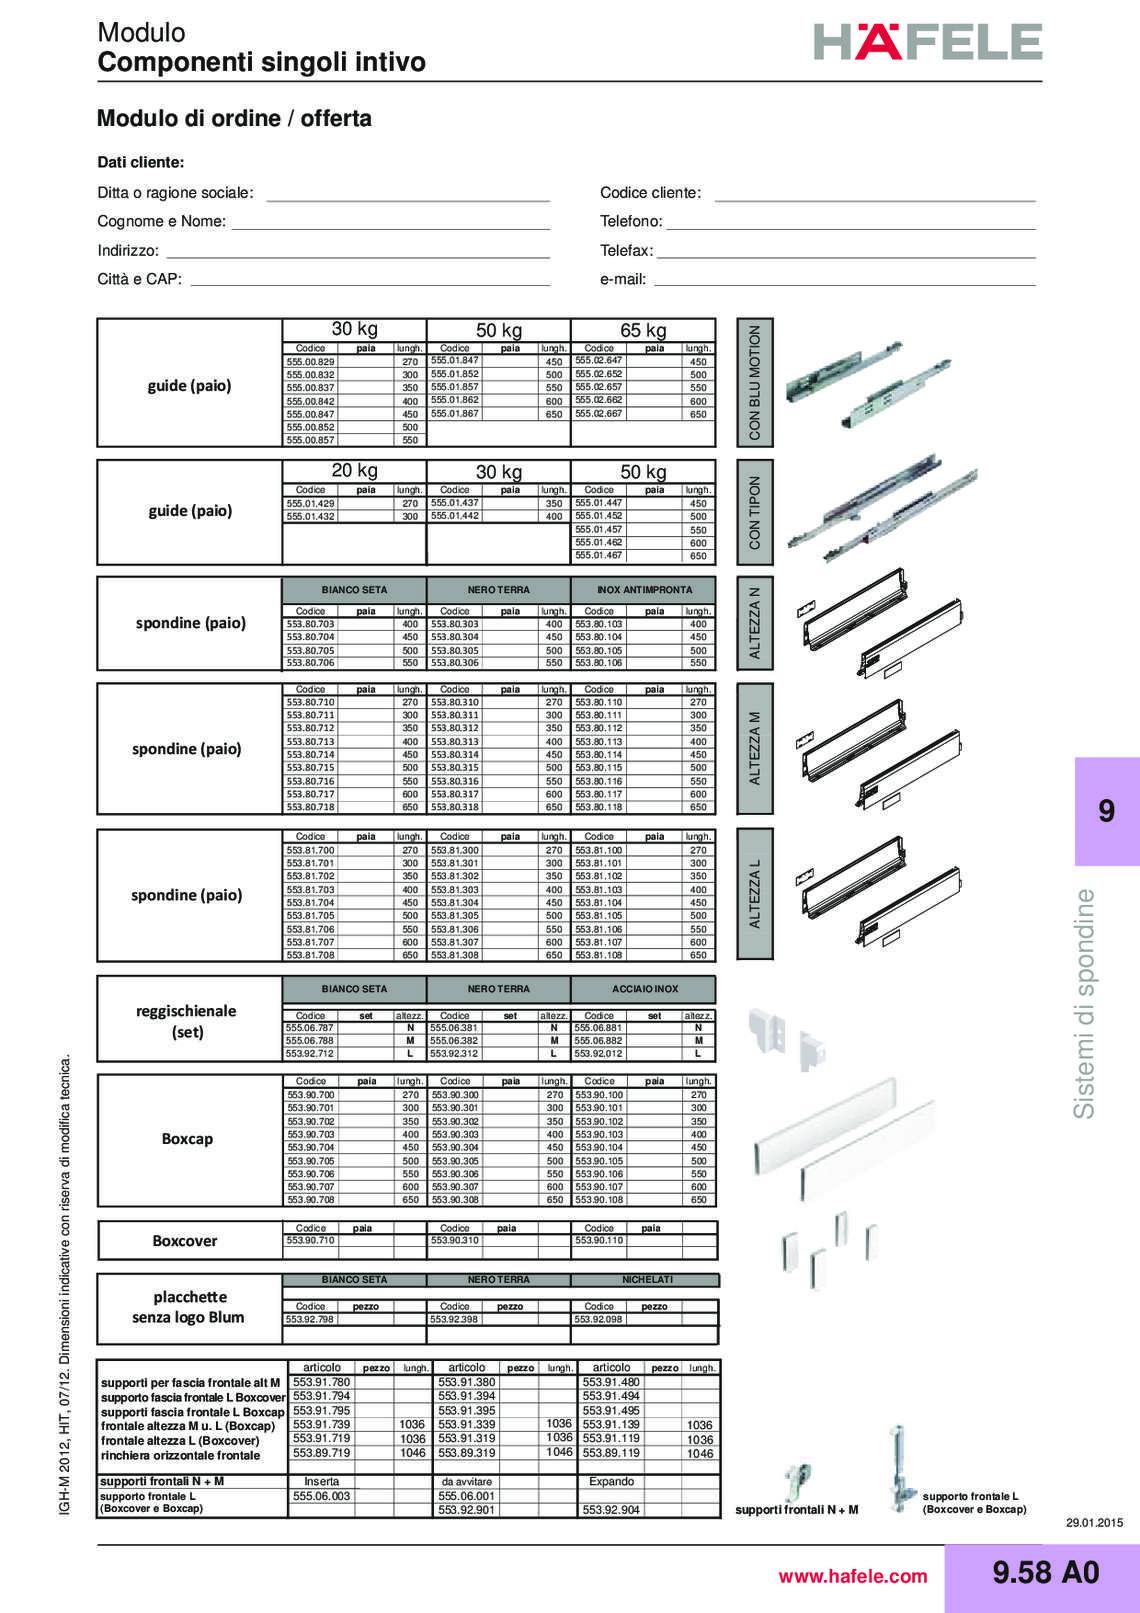 hafele-spondine-e-guide-per-mobili_40_073.jpg